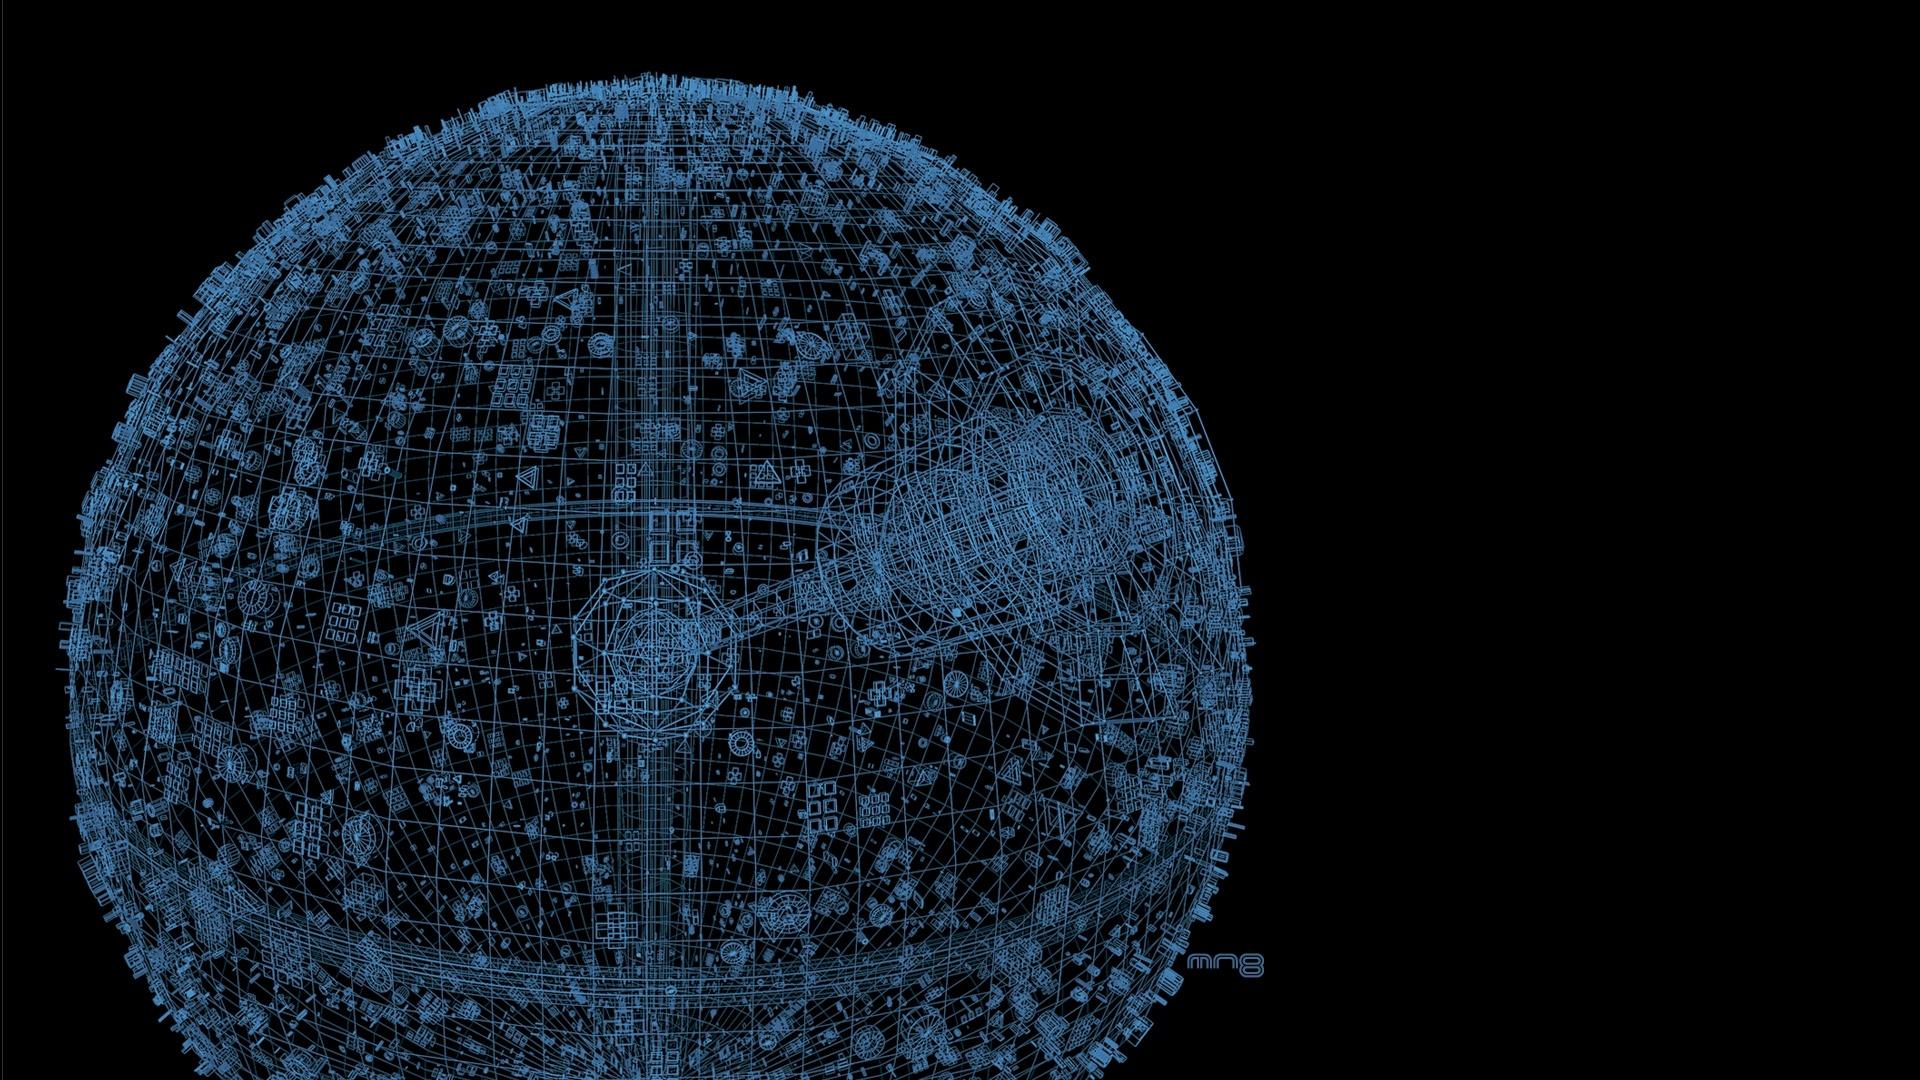 Death Star computer wallpaper